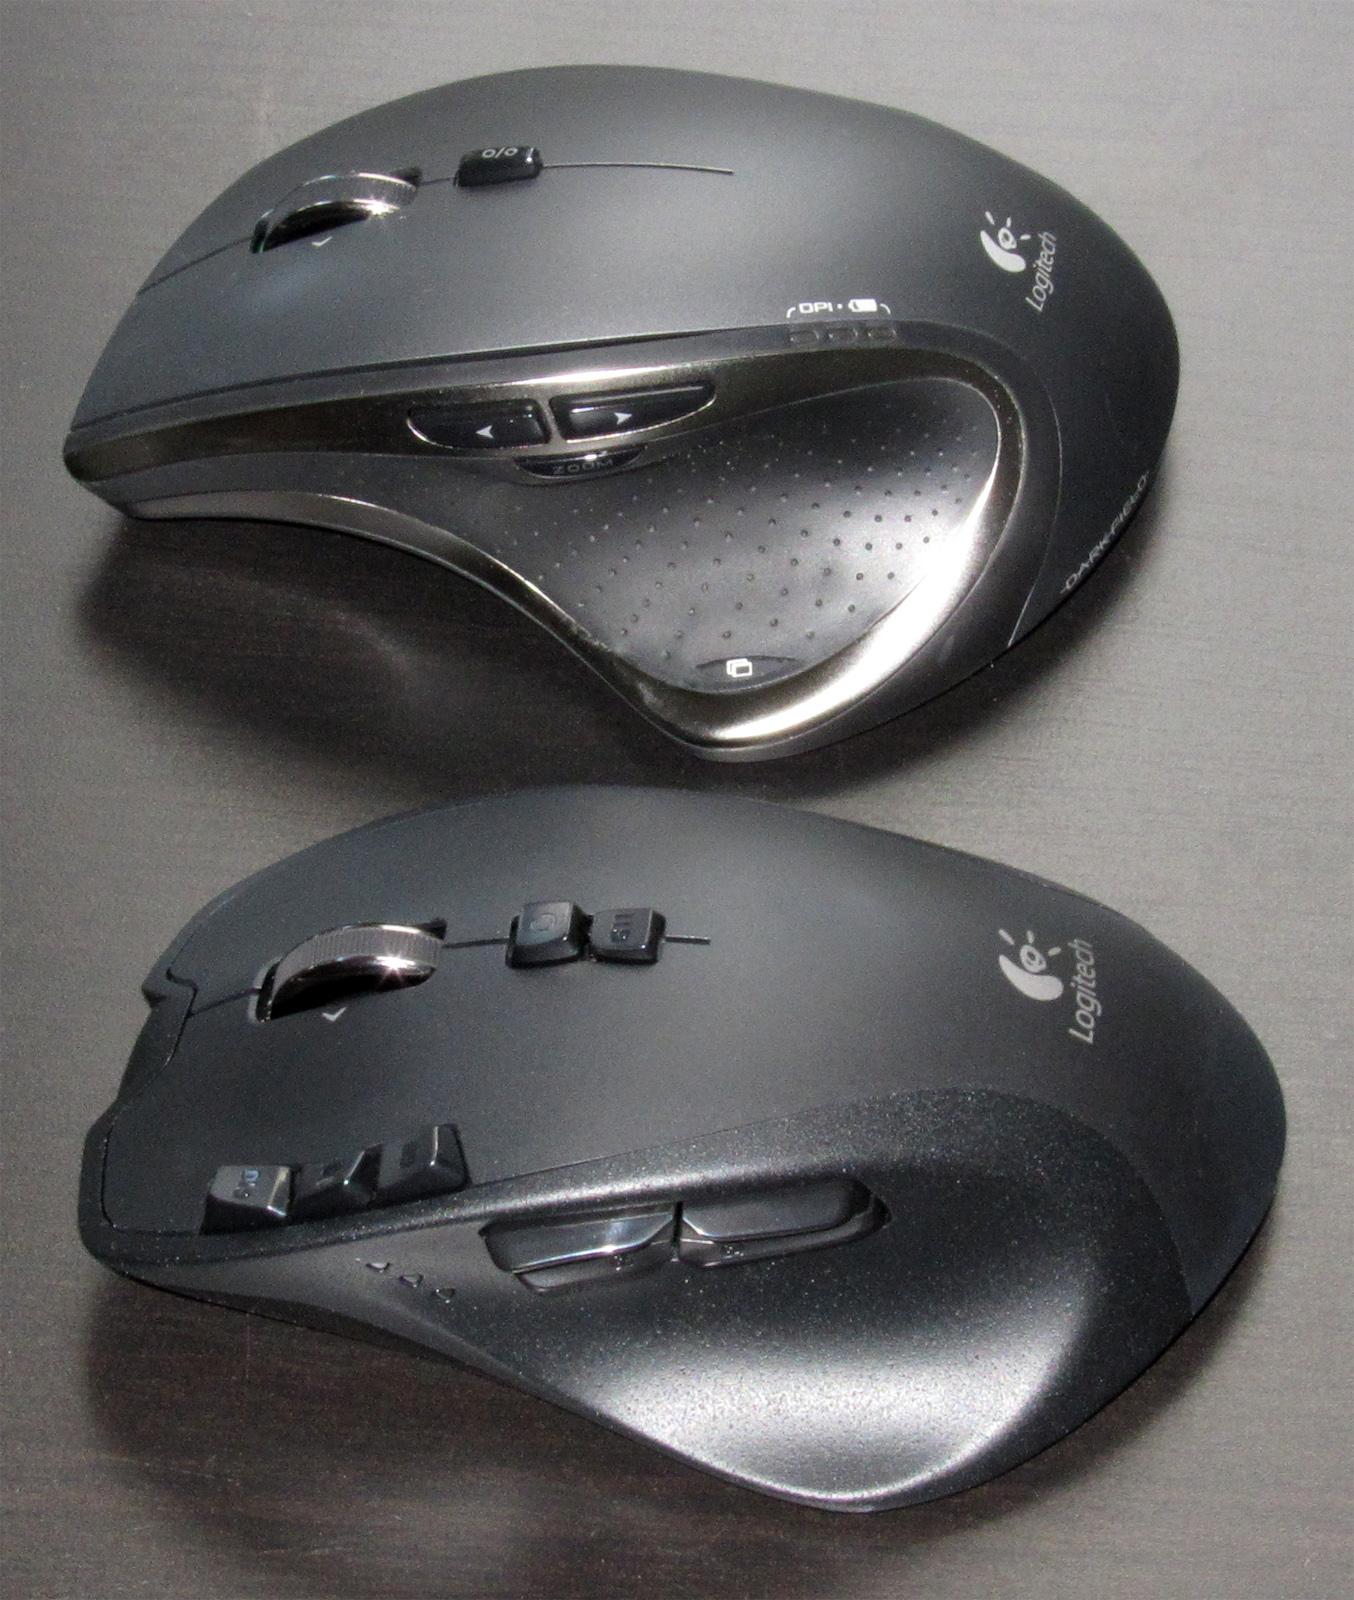 Logitech Performance Mouse MX Driver, Software Download